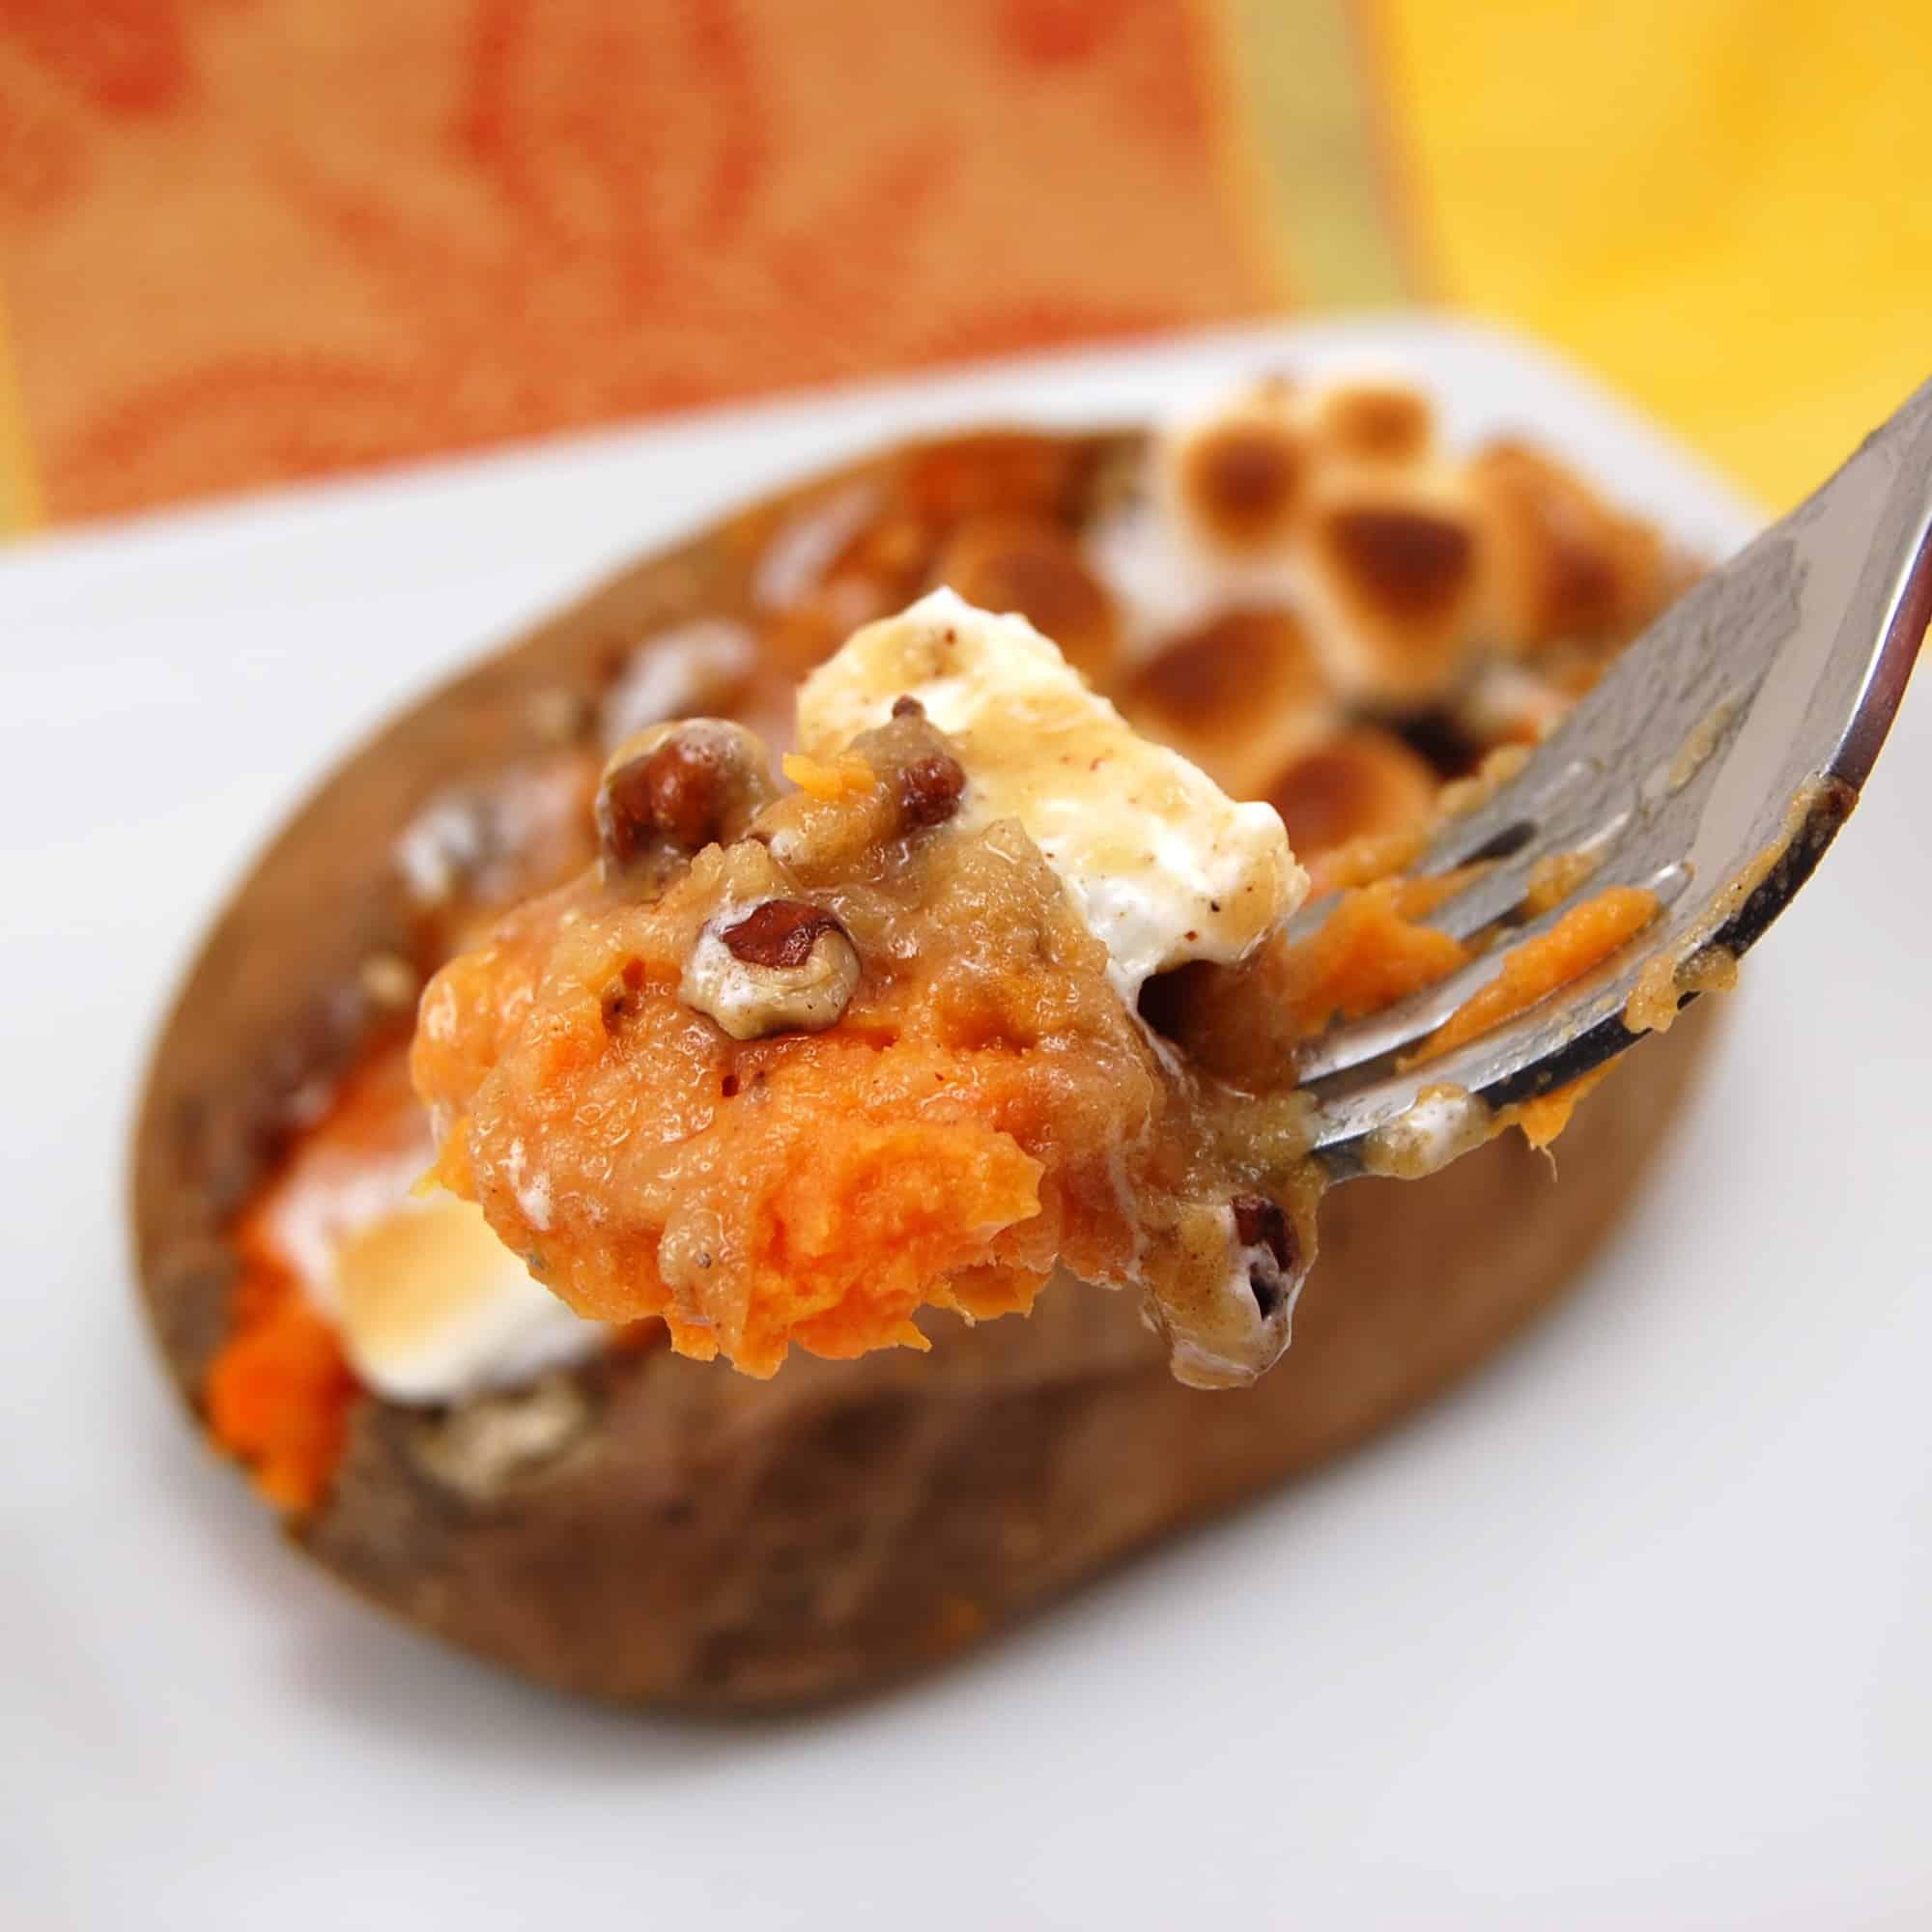 stuffed sweet potatoes on a fork